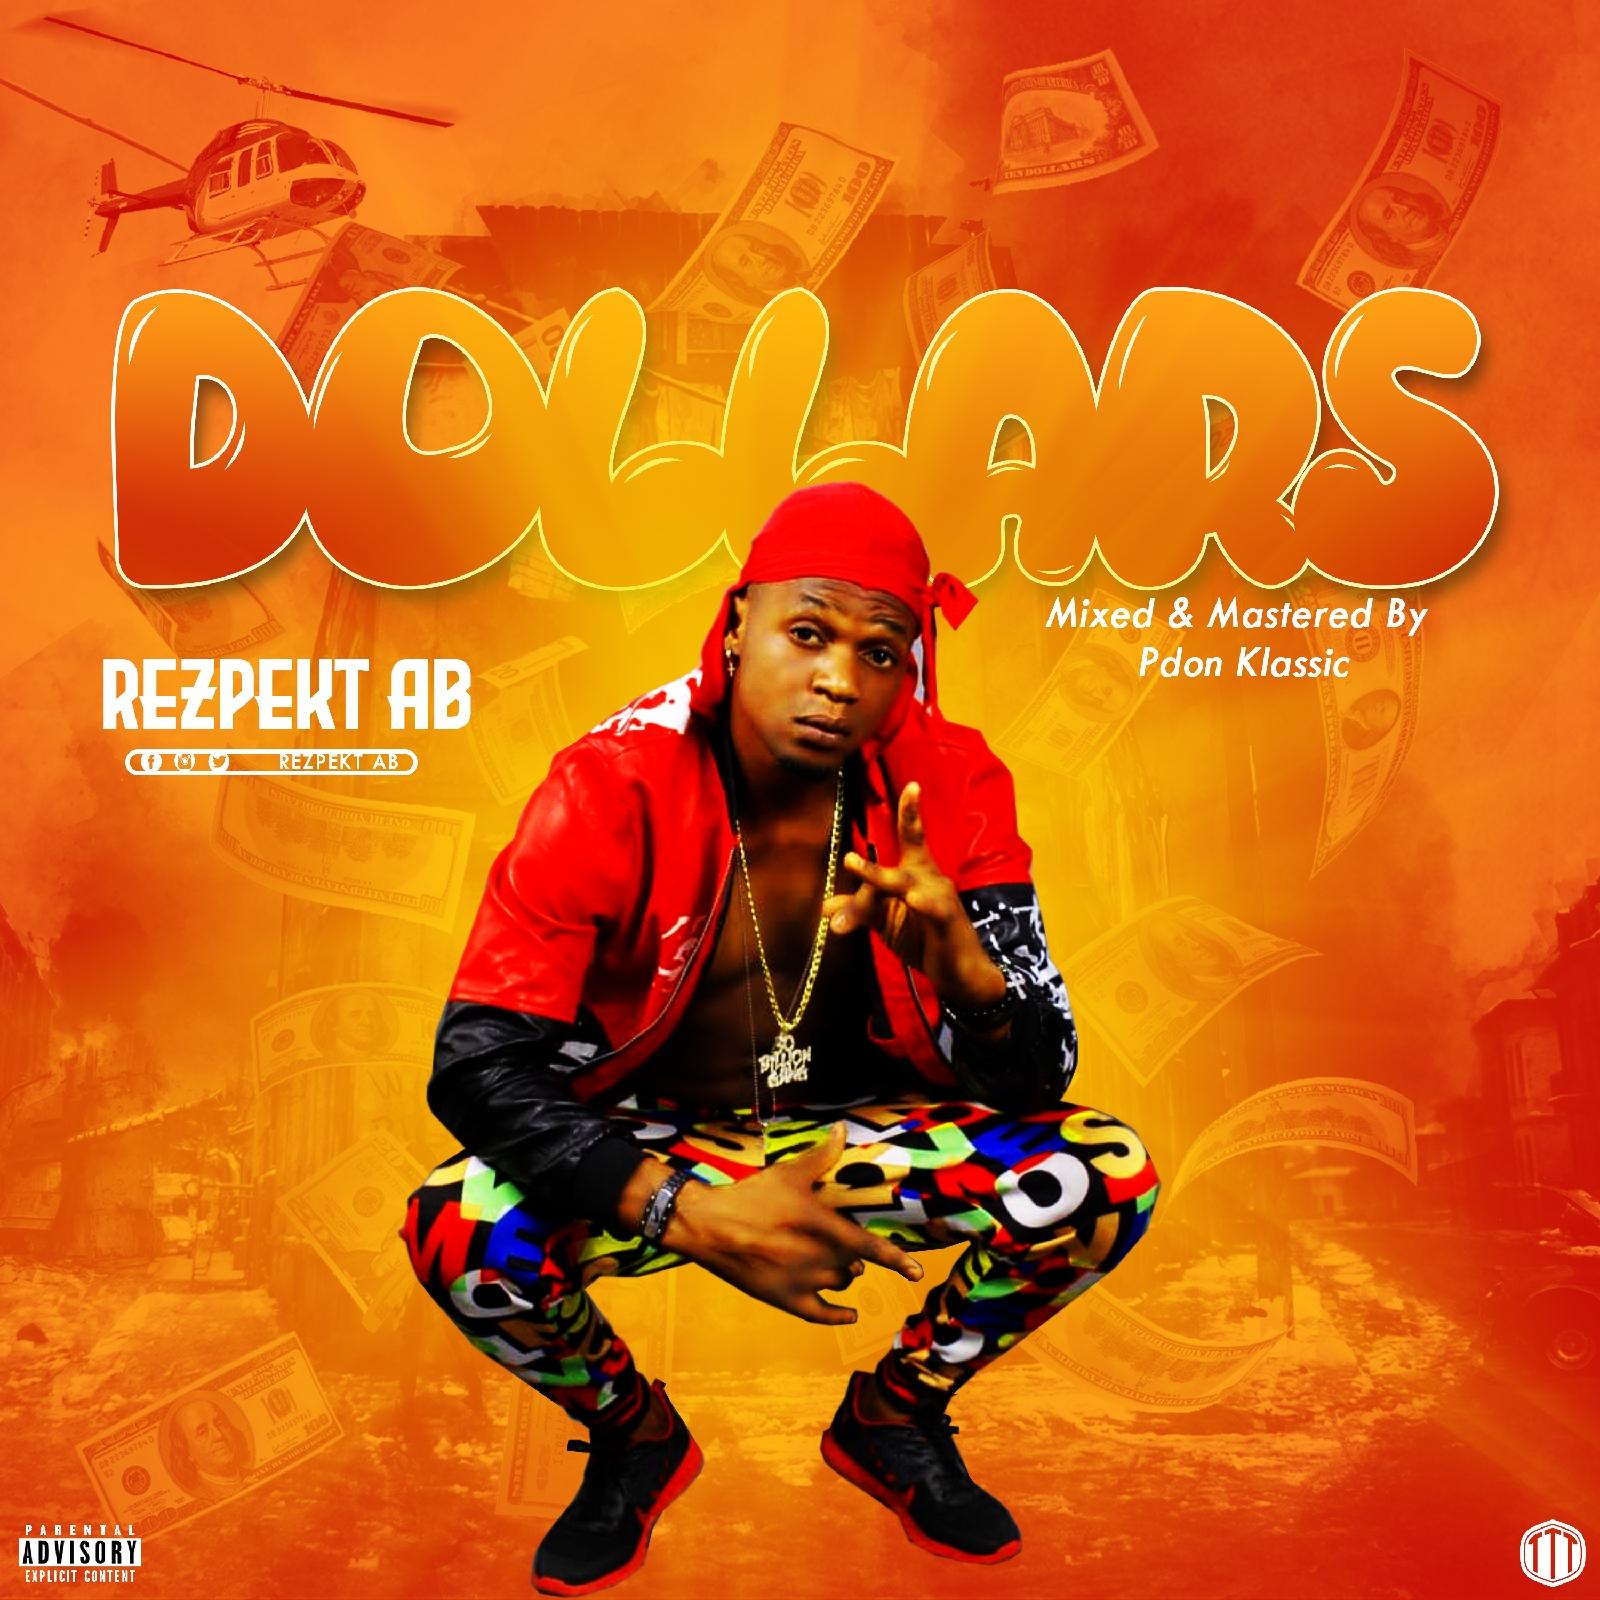 [MUSIC] Rezpekt AB - Dollars